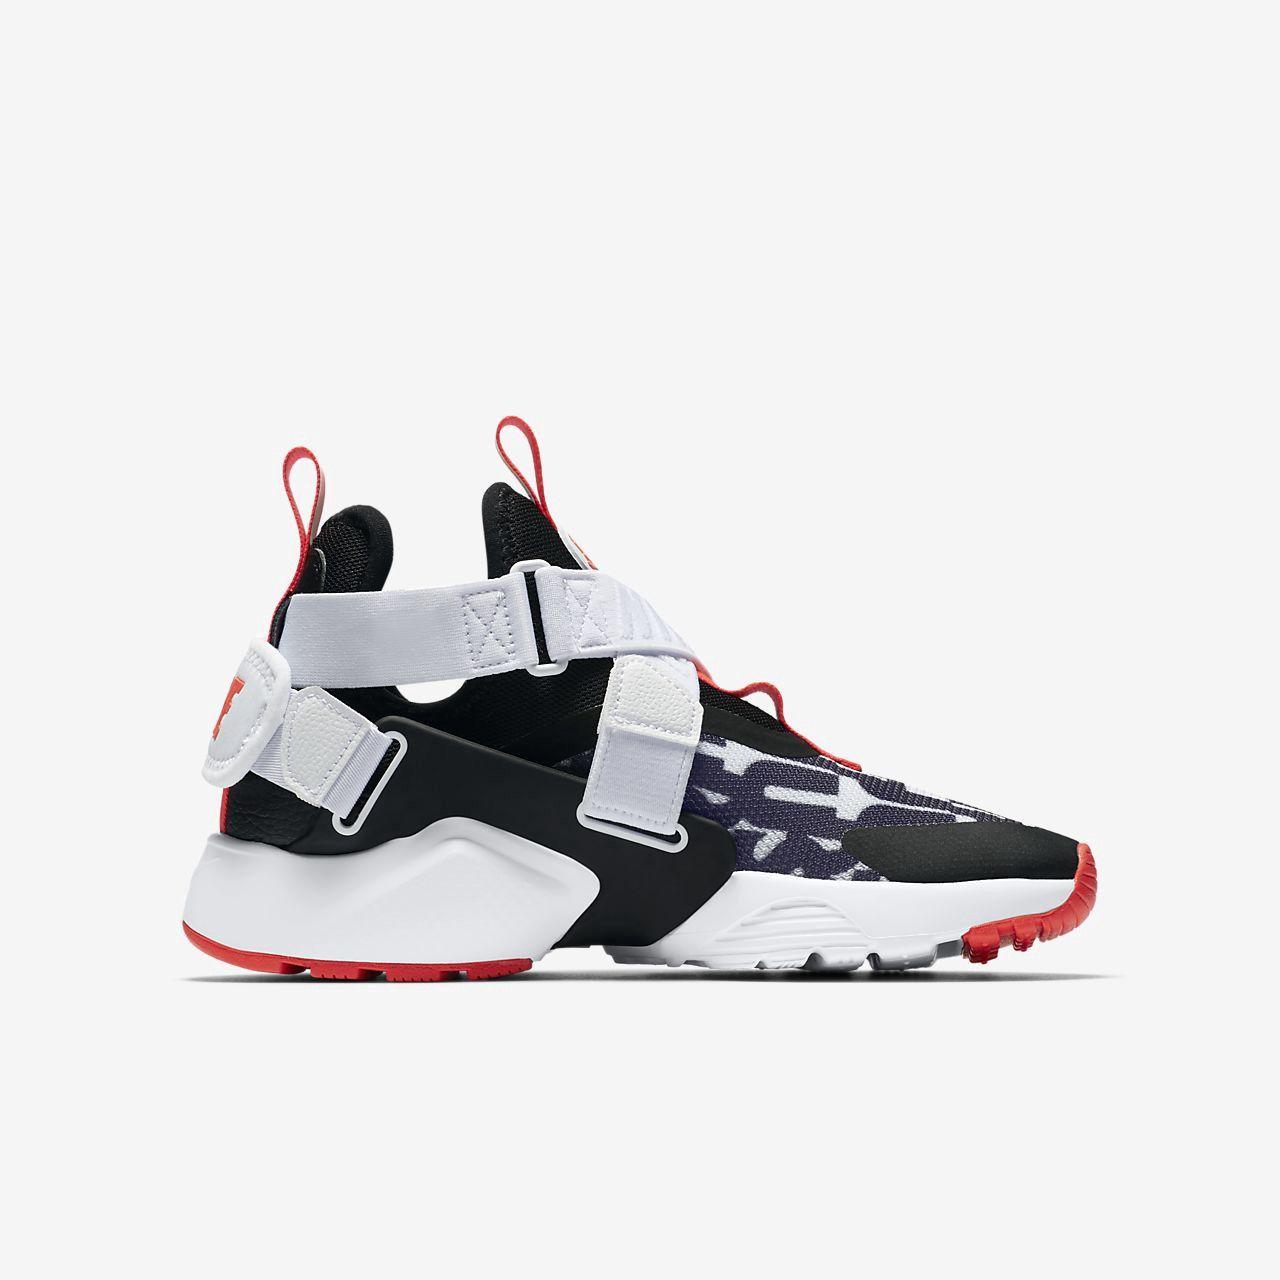 b08d2c8b3e4b Nike Huarache City Jdi Premium Big Kids  (Boys ) Shoe - 3.5Y Crimson ...